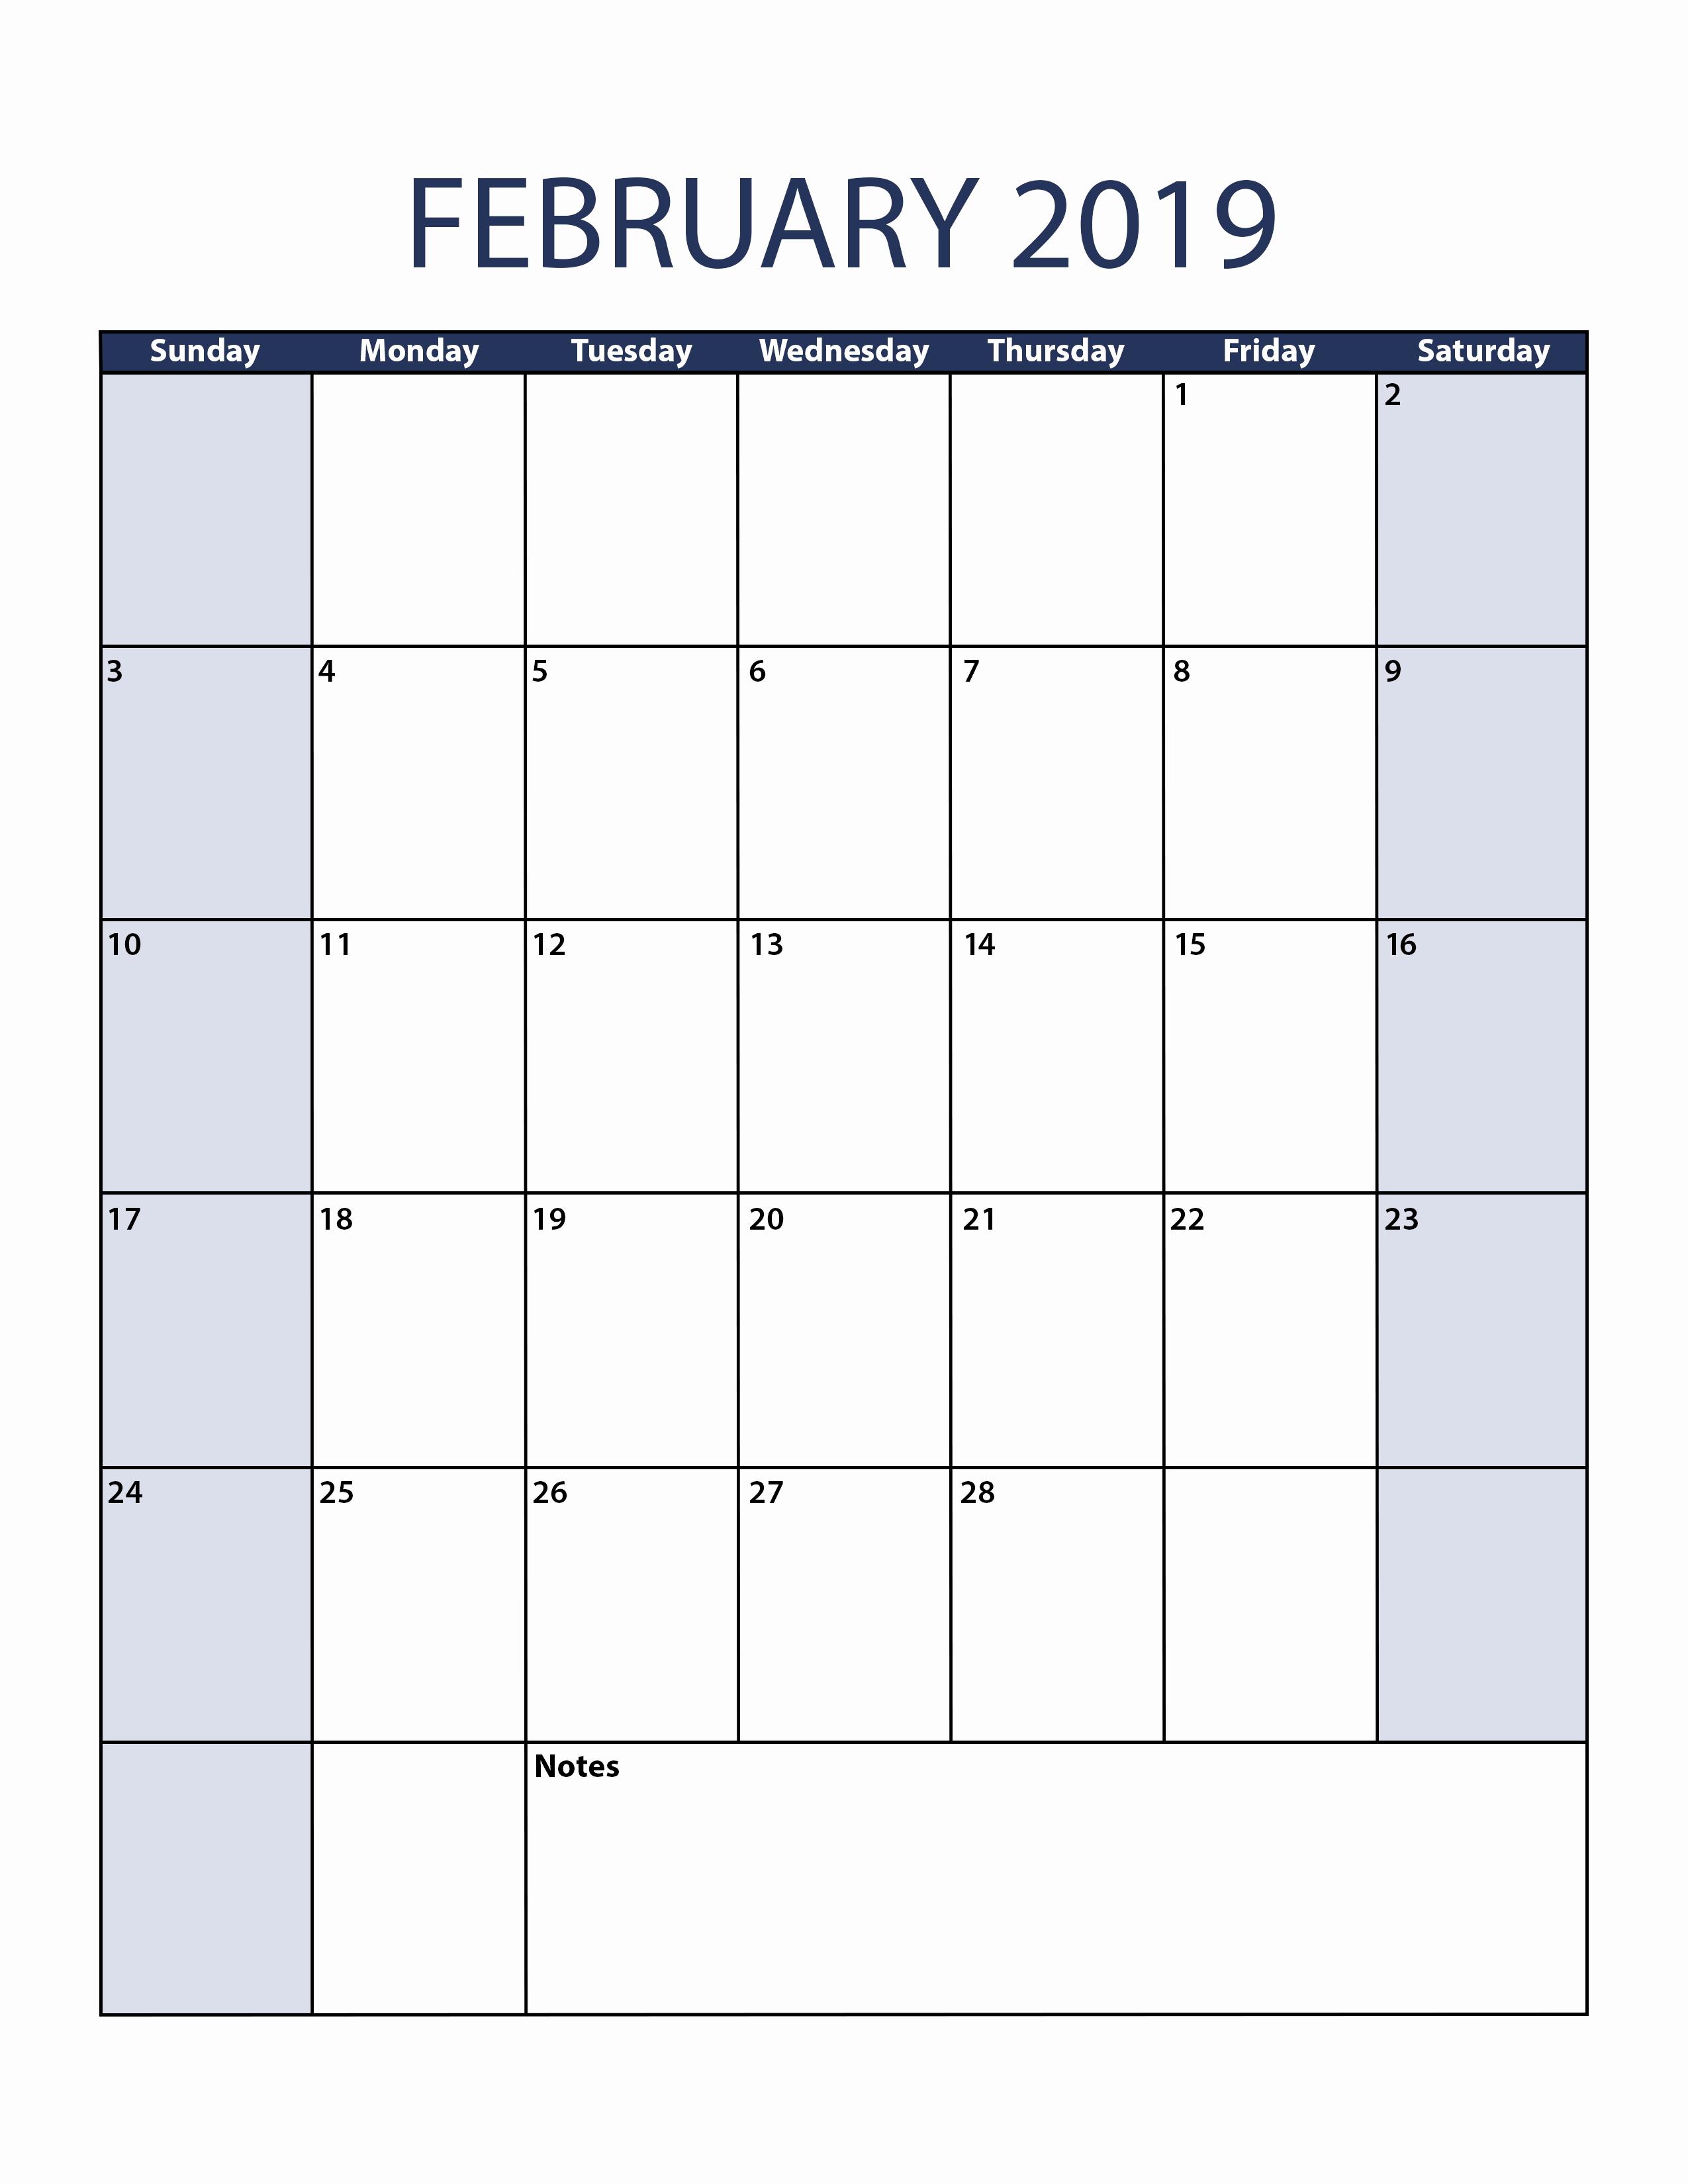 February 2019 Calendar Vertical